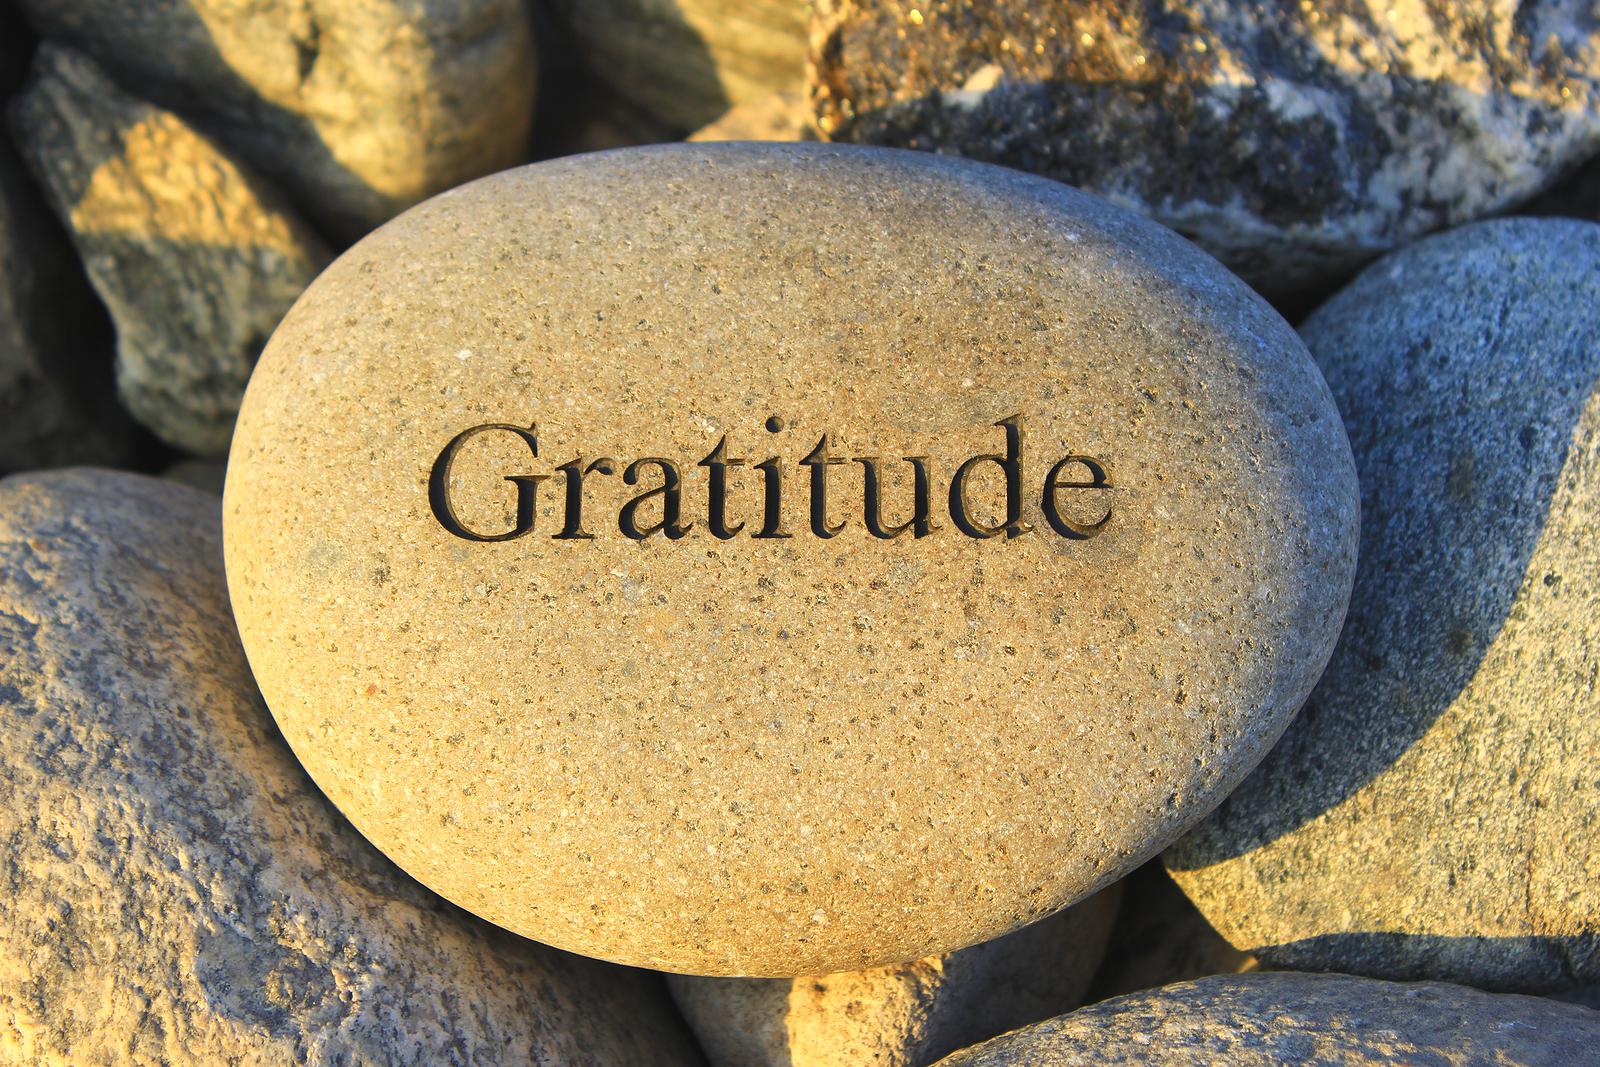 Chiropractor Fenton Michigan - Gratitude